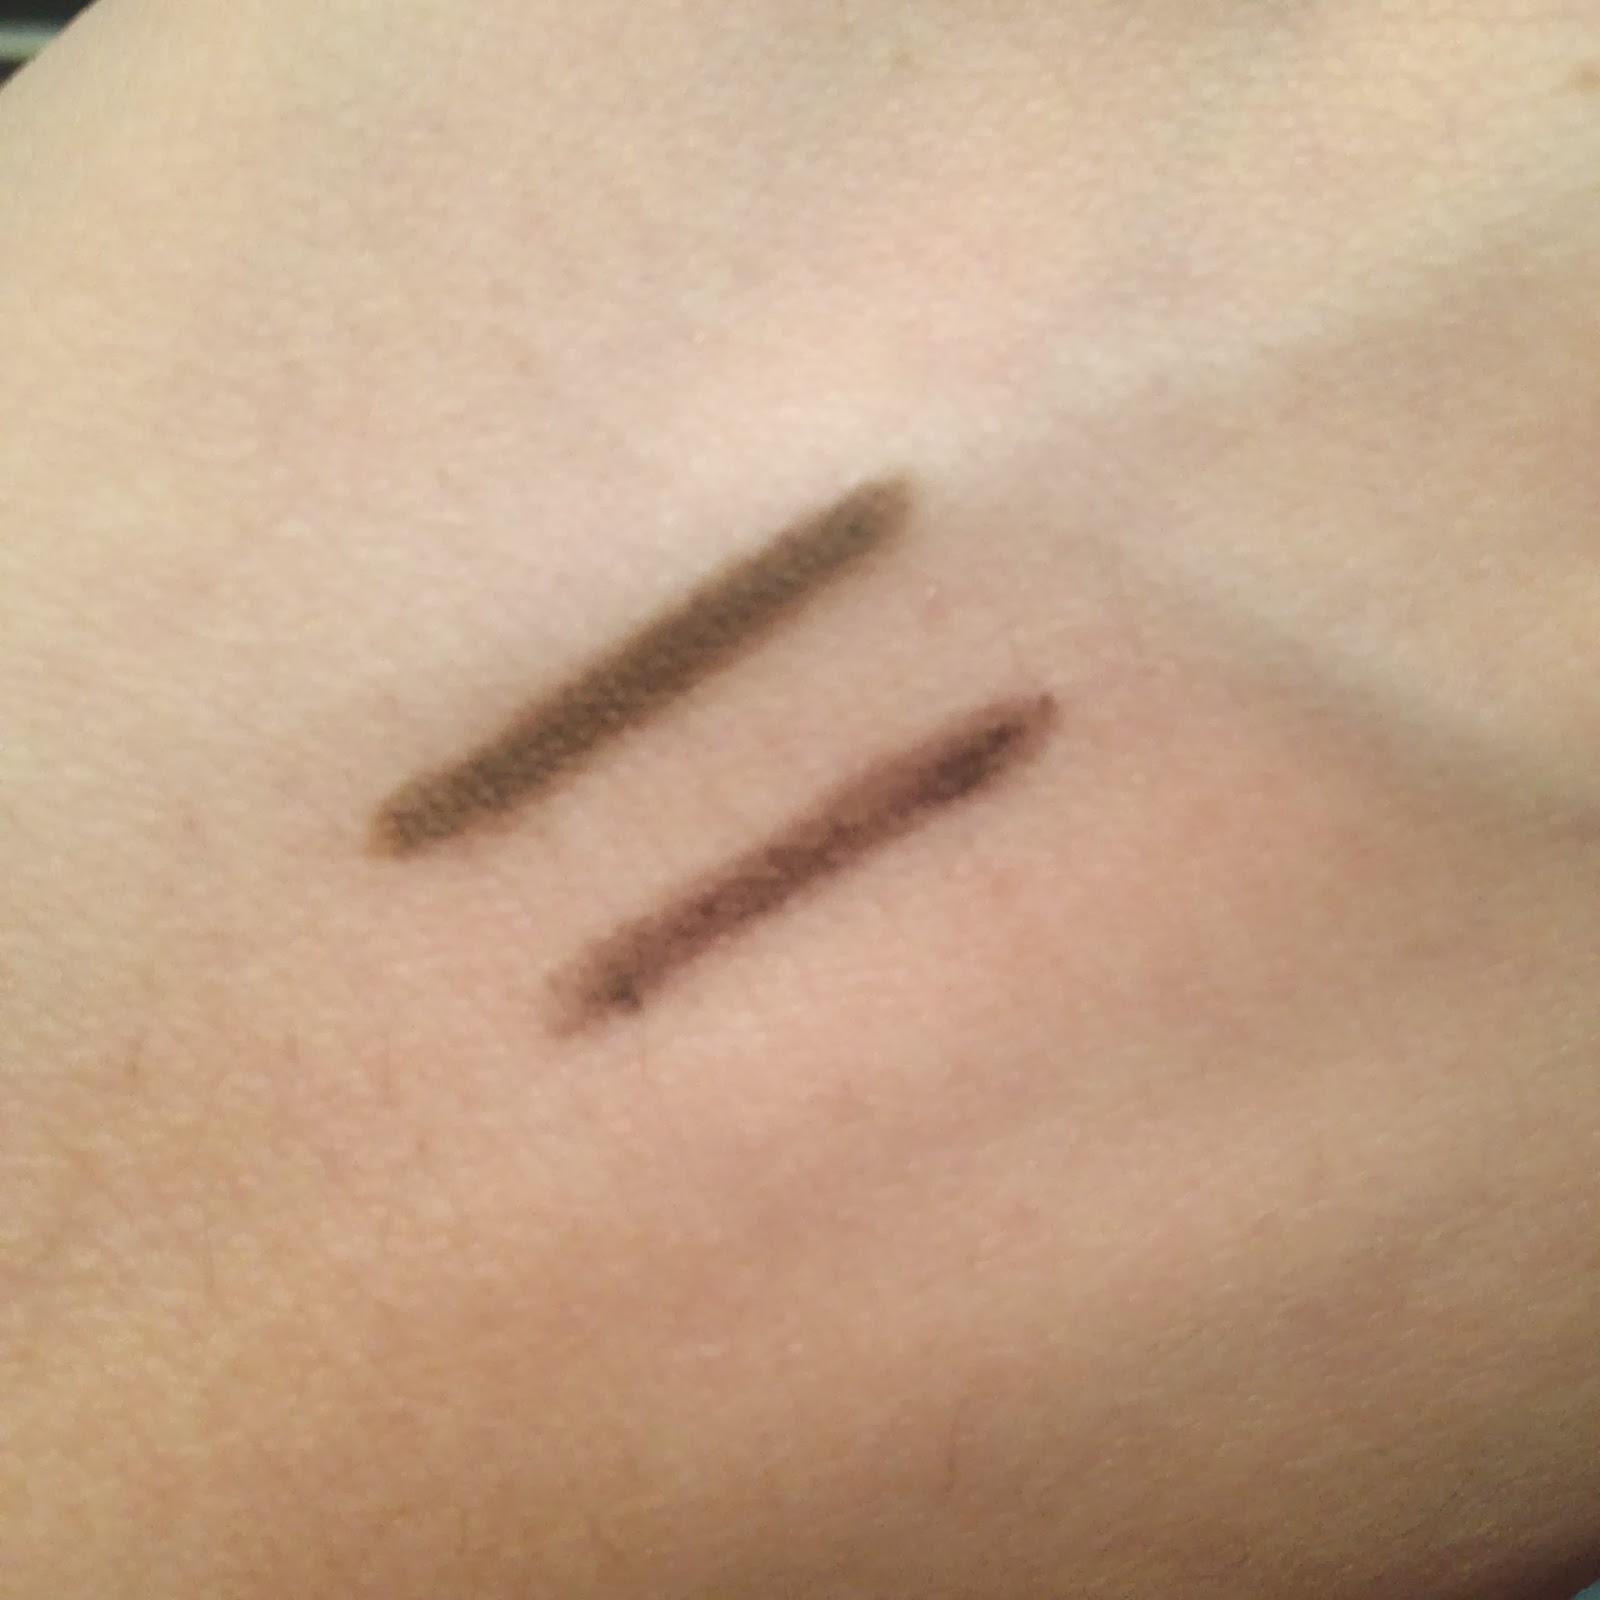 Is It A Dupe Chella Eyebrow Pencil Vs Maybelline Define A Brow